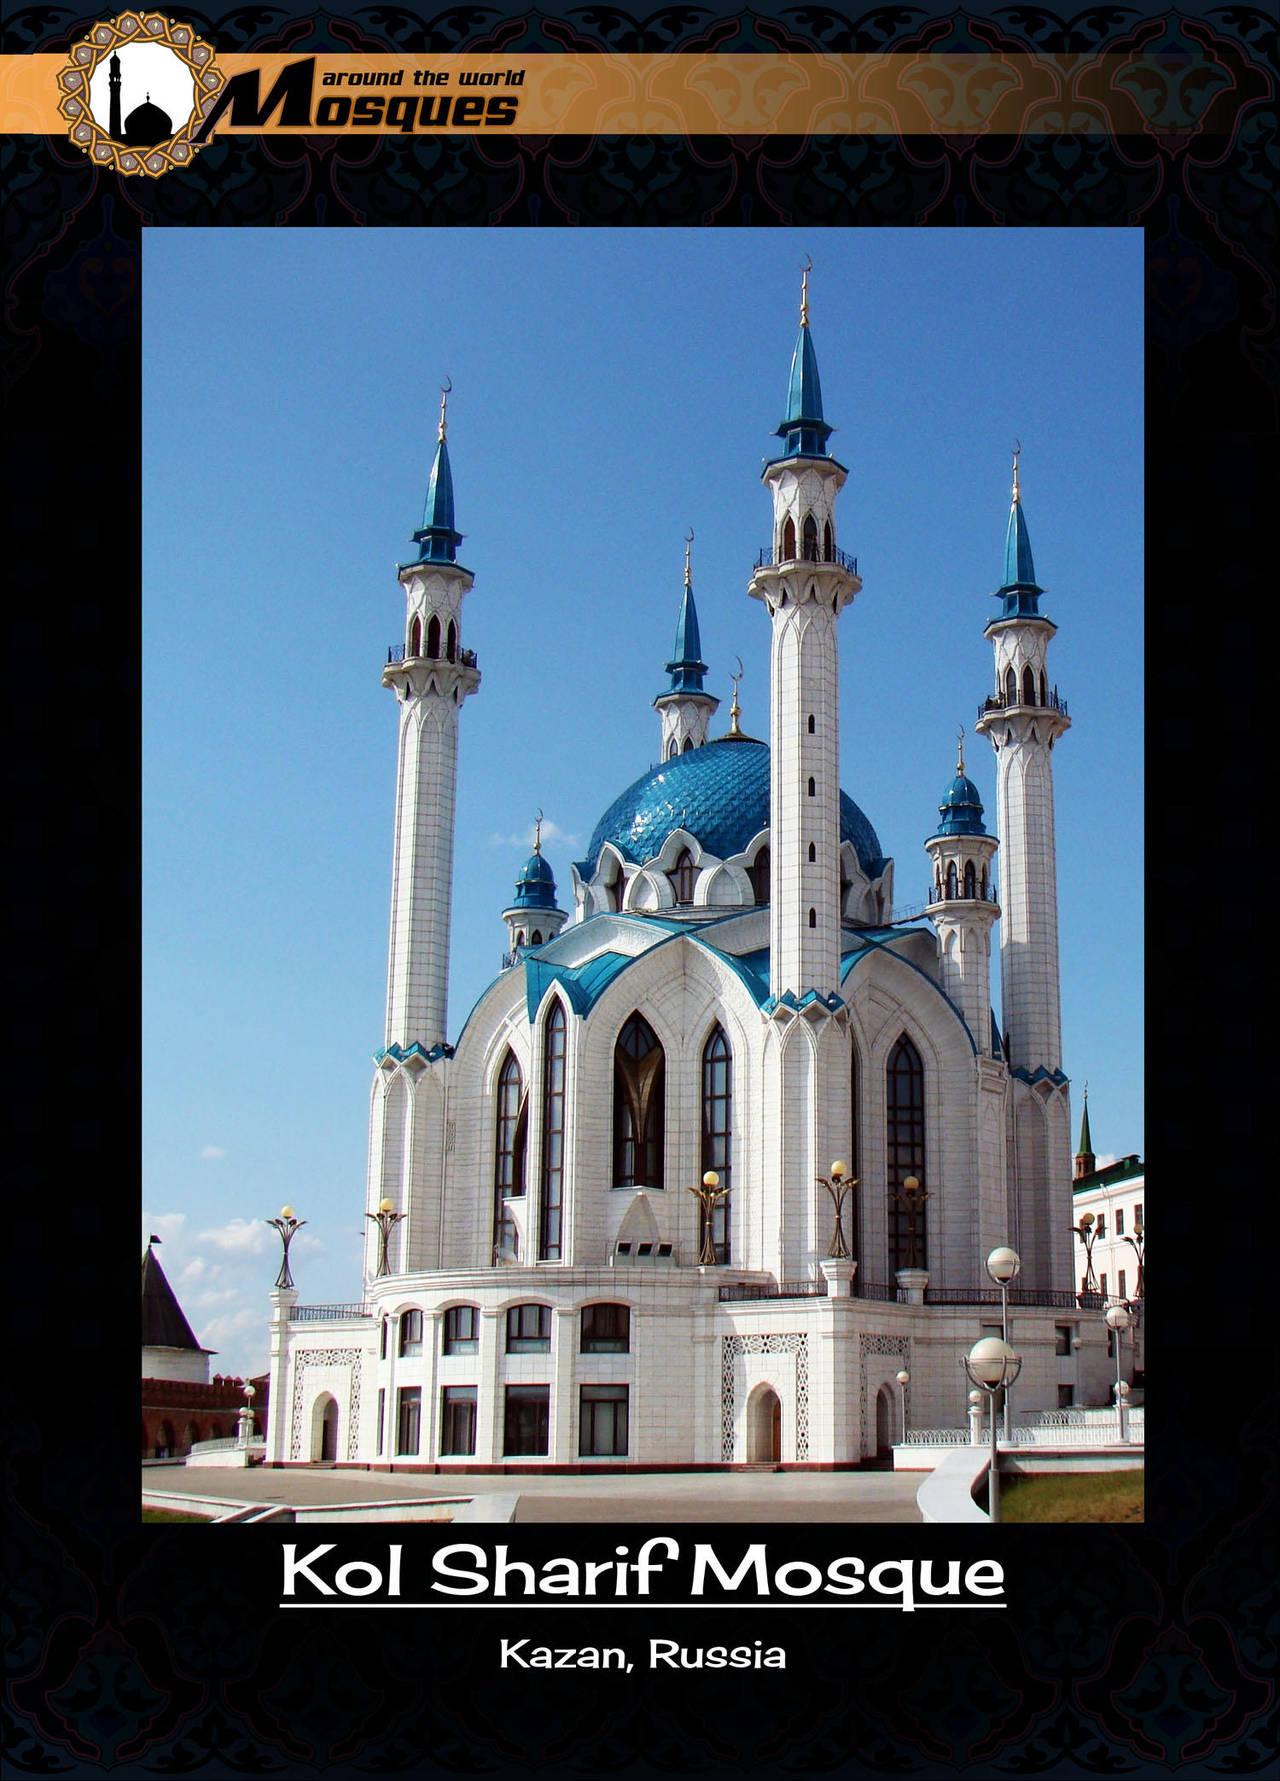 Mosques around the world - 1 by Nayzak